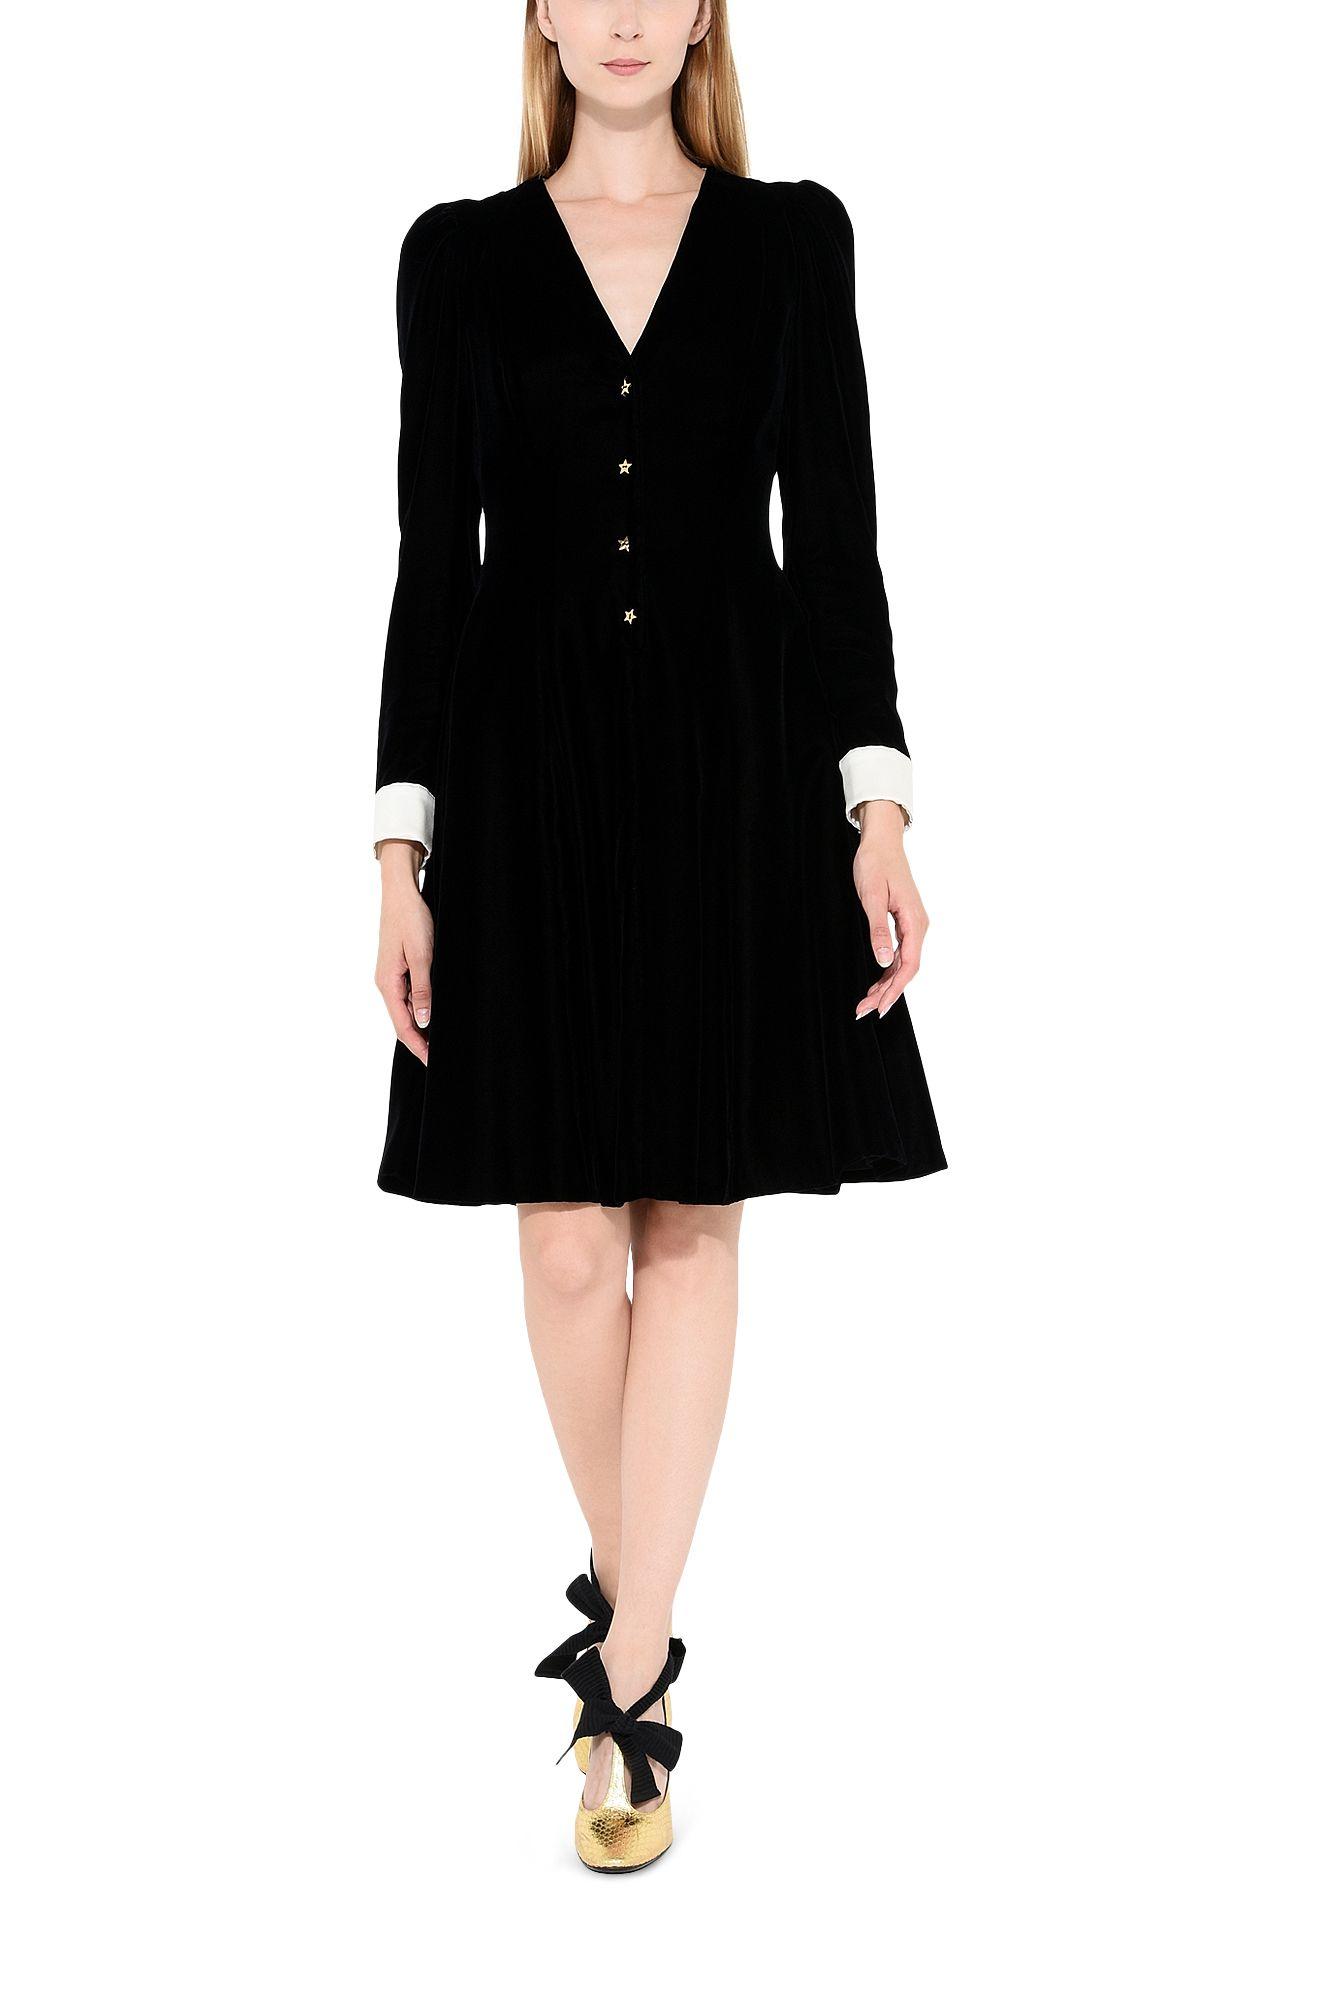 PHILOSOPHY di LORENZO SERAFINI ショートドレス D ムーヴィー・ドレス r